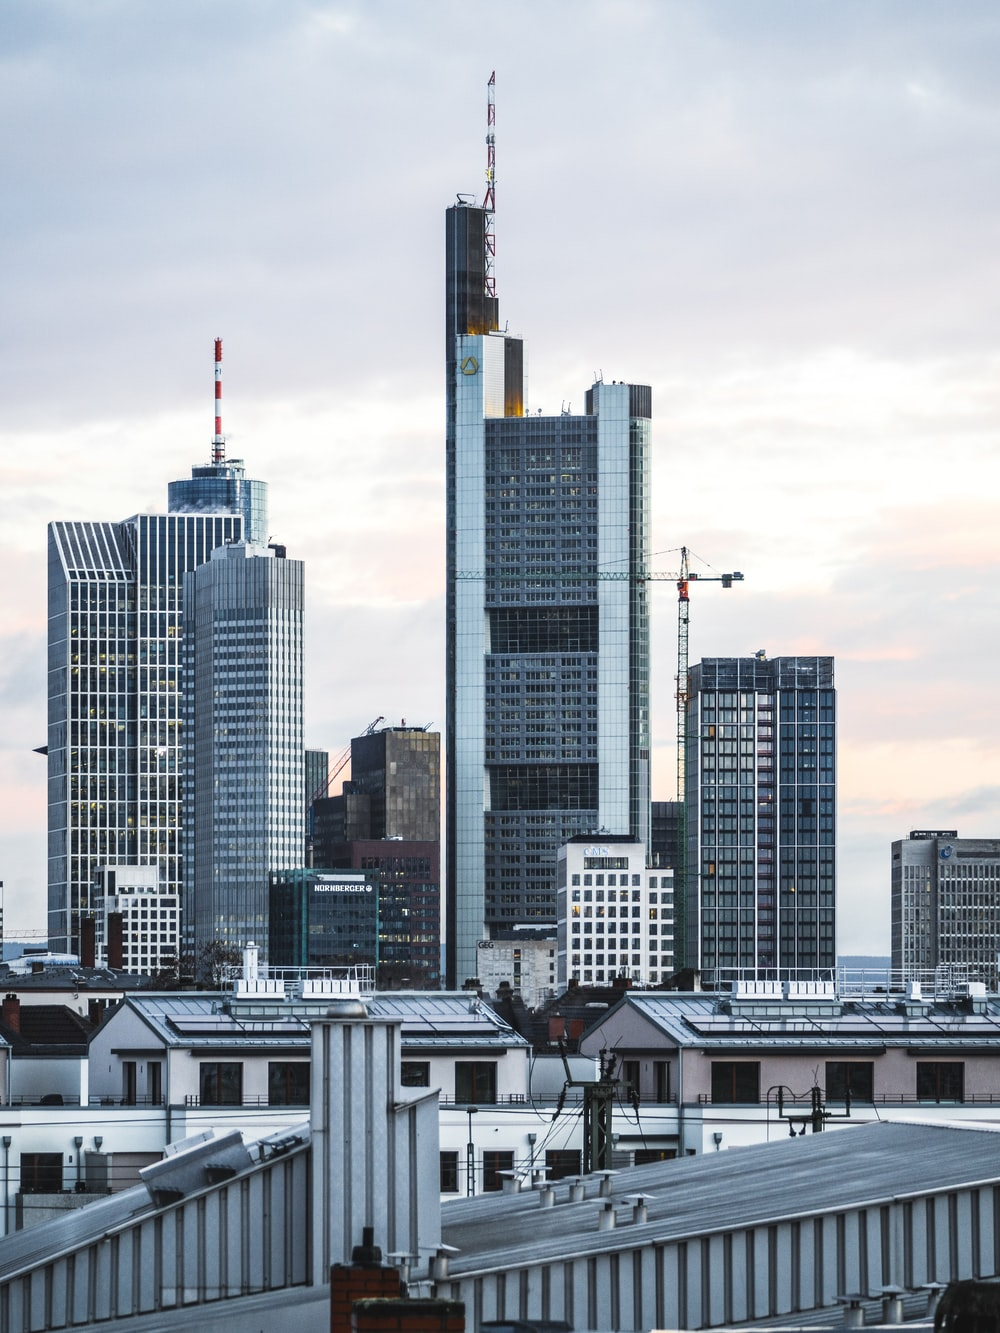 grey high-rise buildings under grey cloudy sky